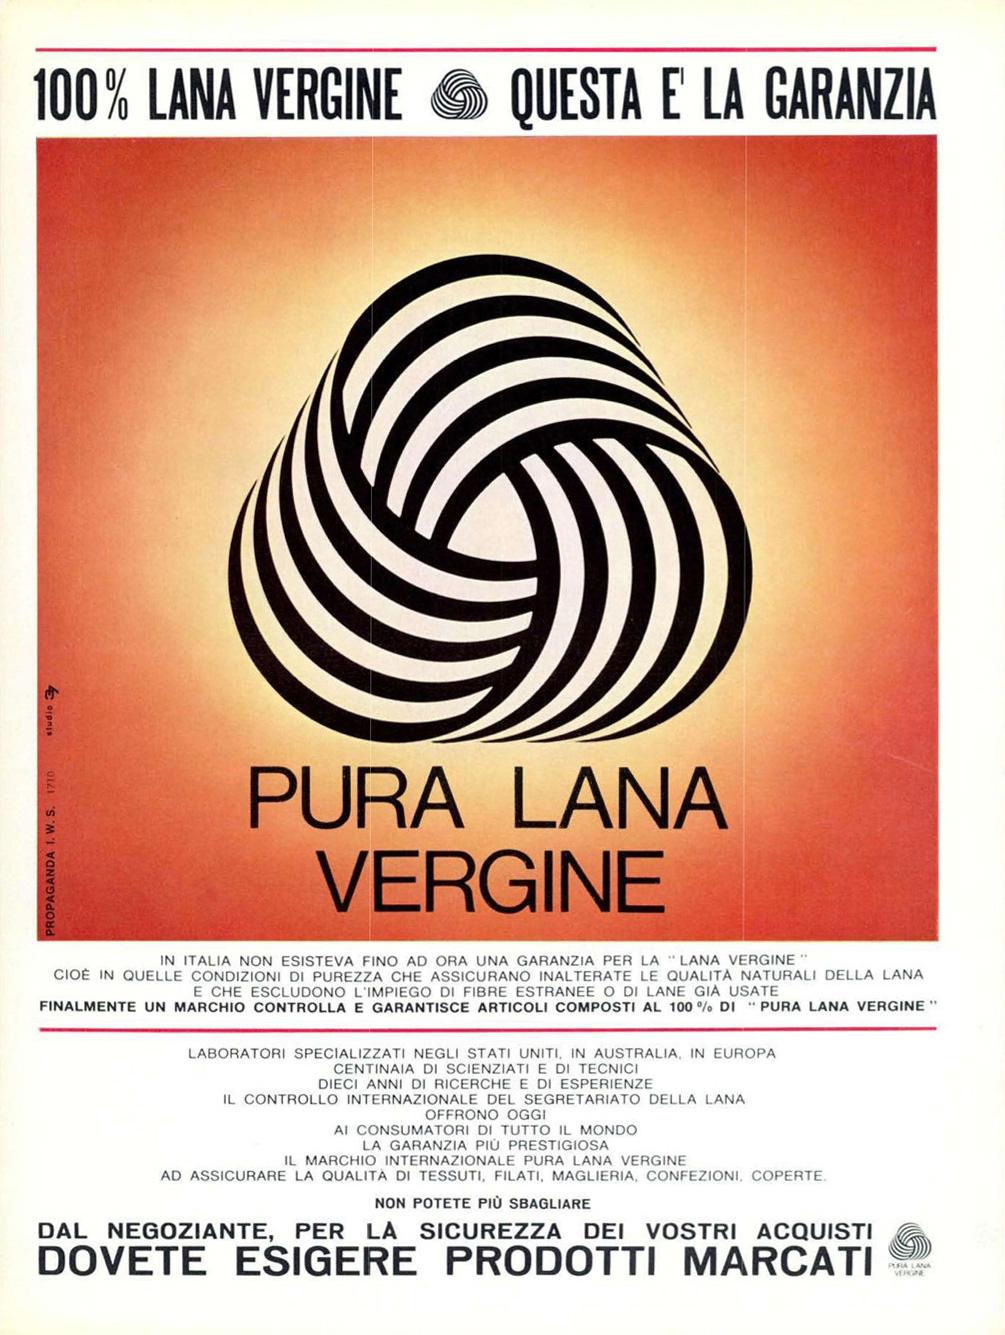 Woolmark Ad in Italy, 1965